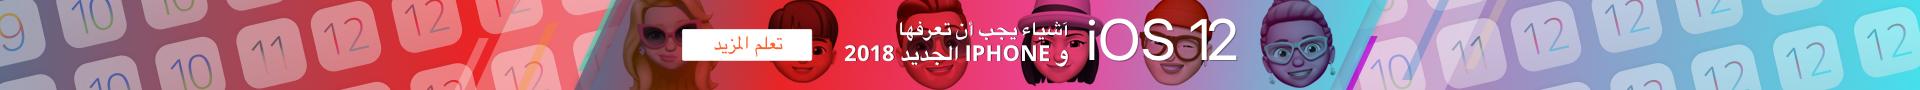 iOS 12 و آيفون الجديد 2018